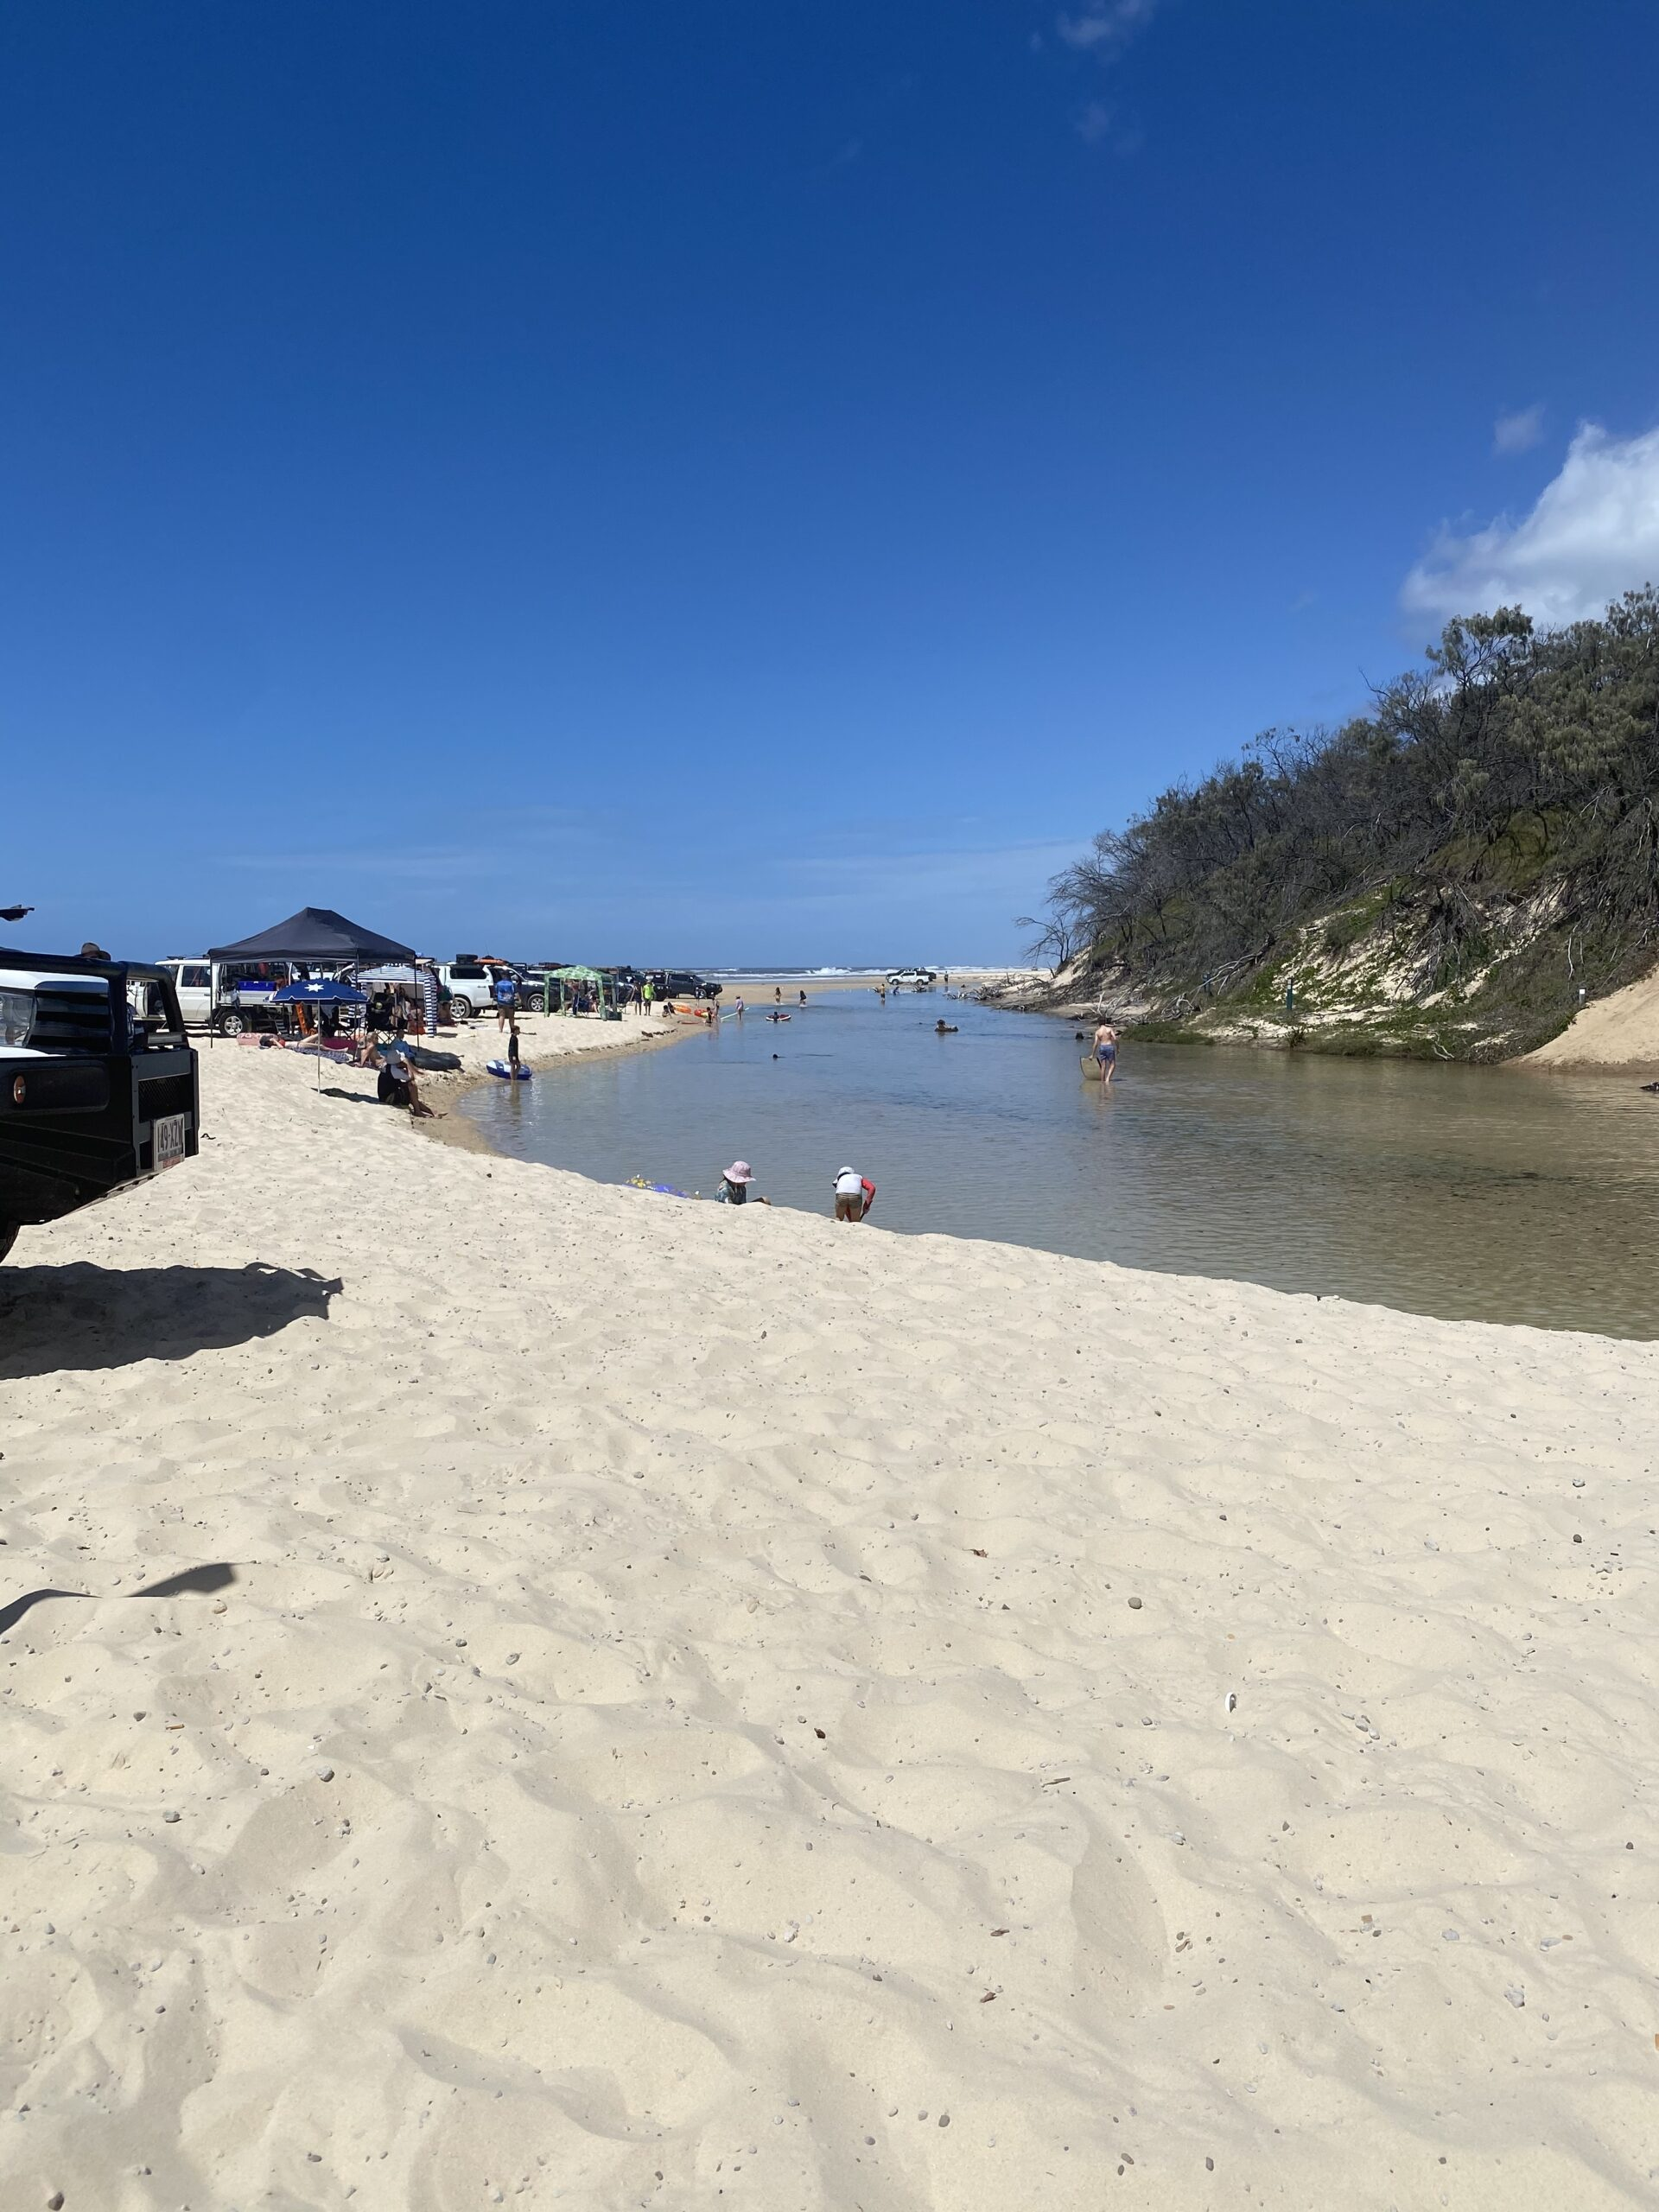 Cars parked along Eli Creek as it runs into the Ocean